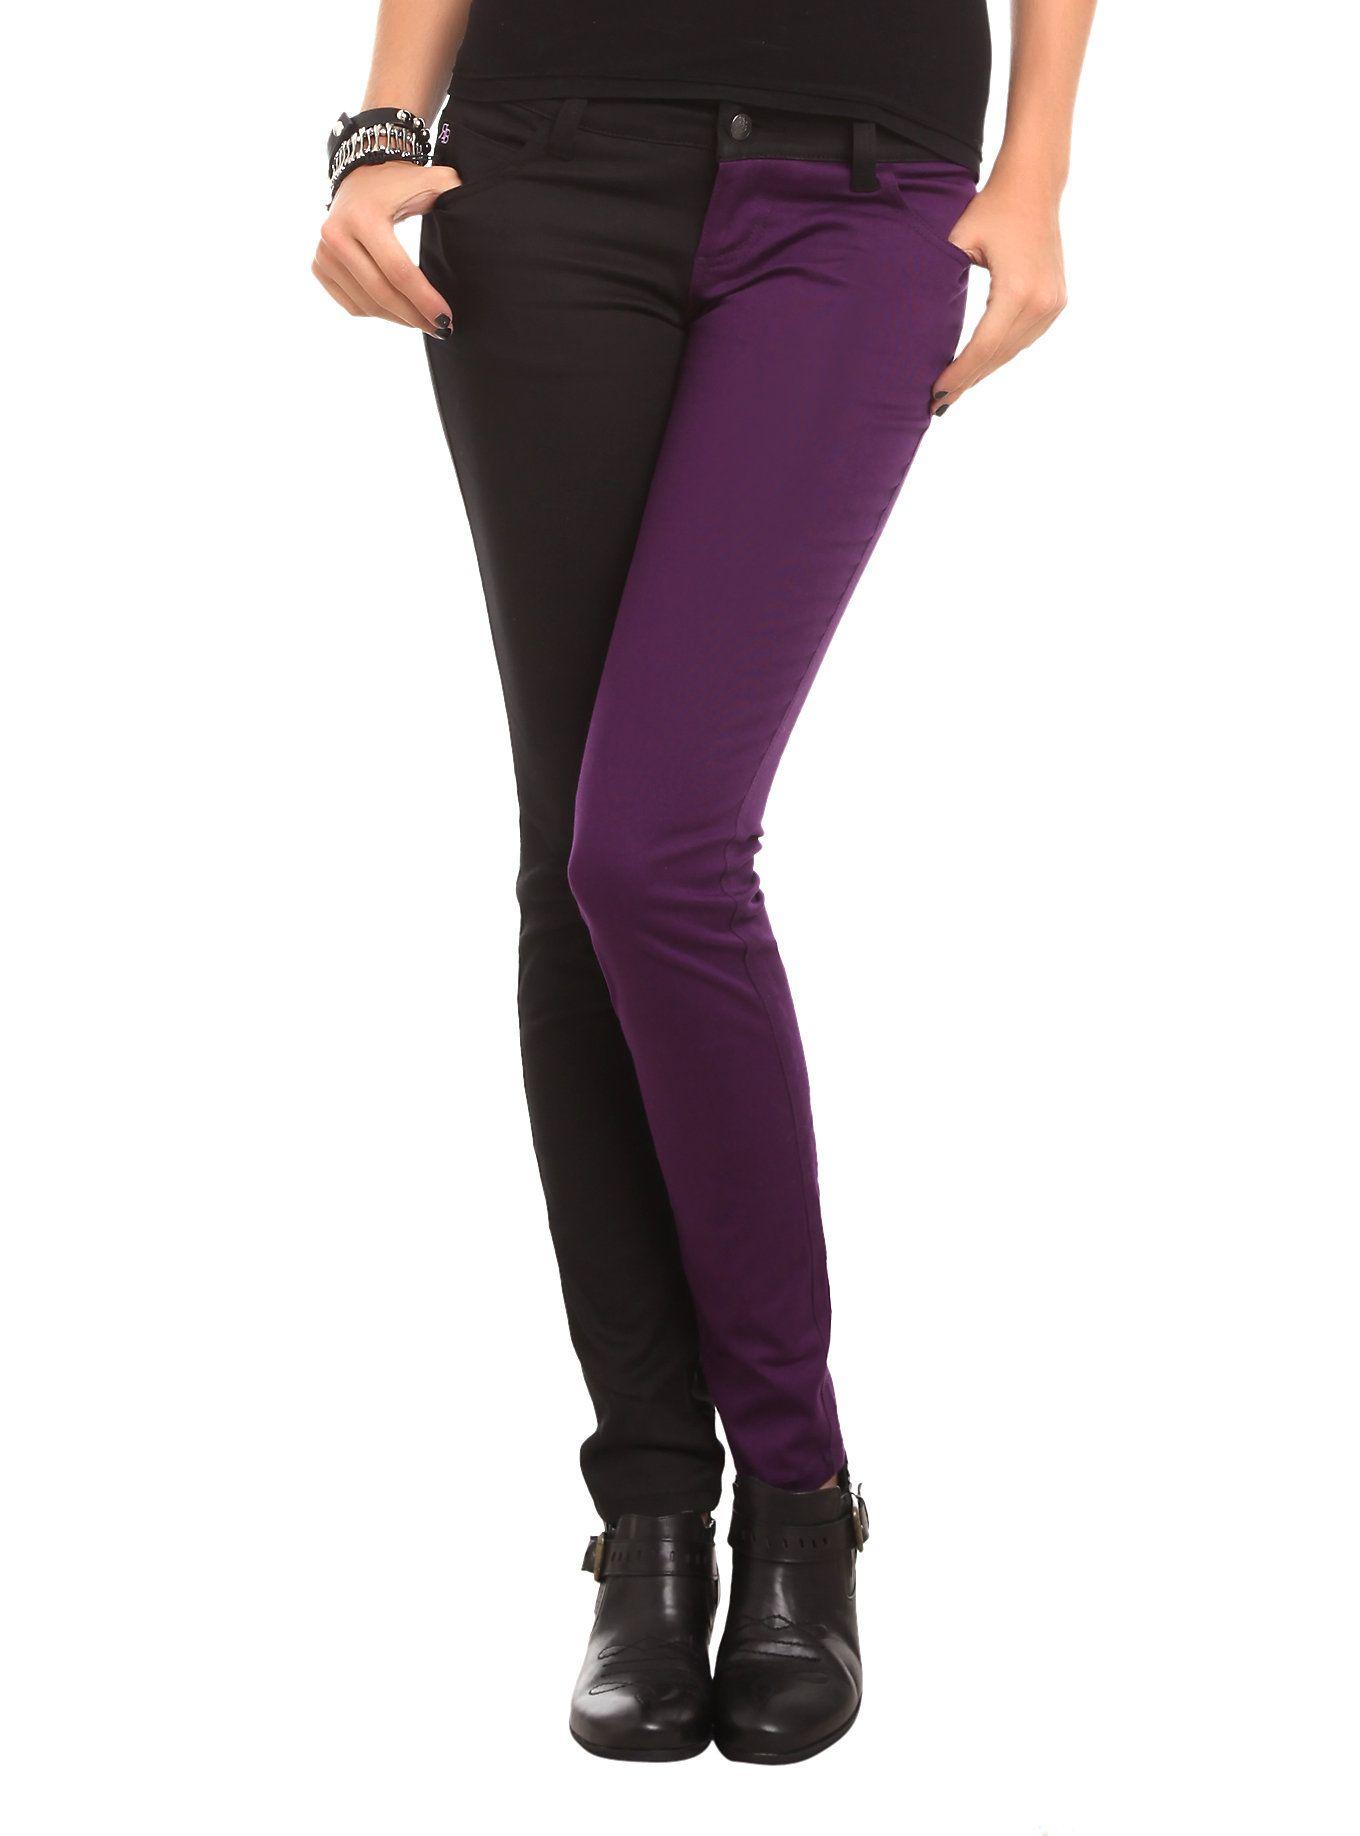 Royal Bones Purple And Black Split Leg Skinny Jeans | Hot Topic ...